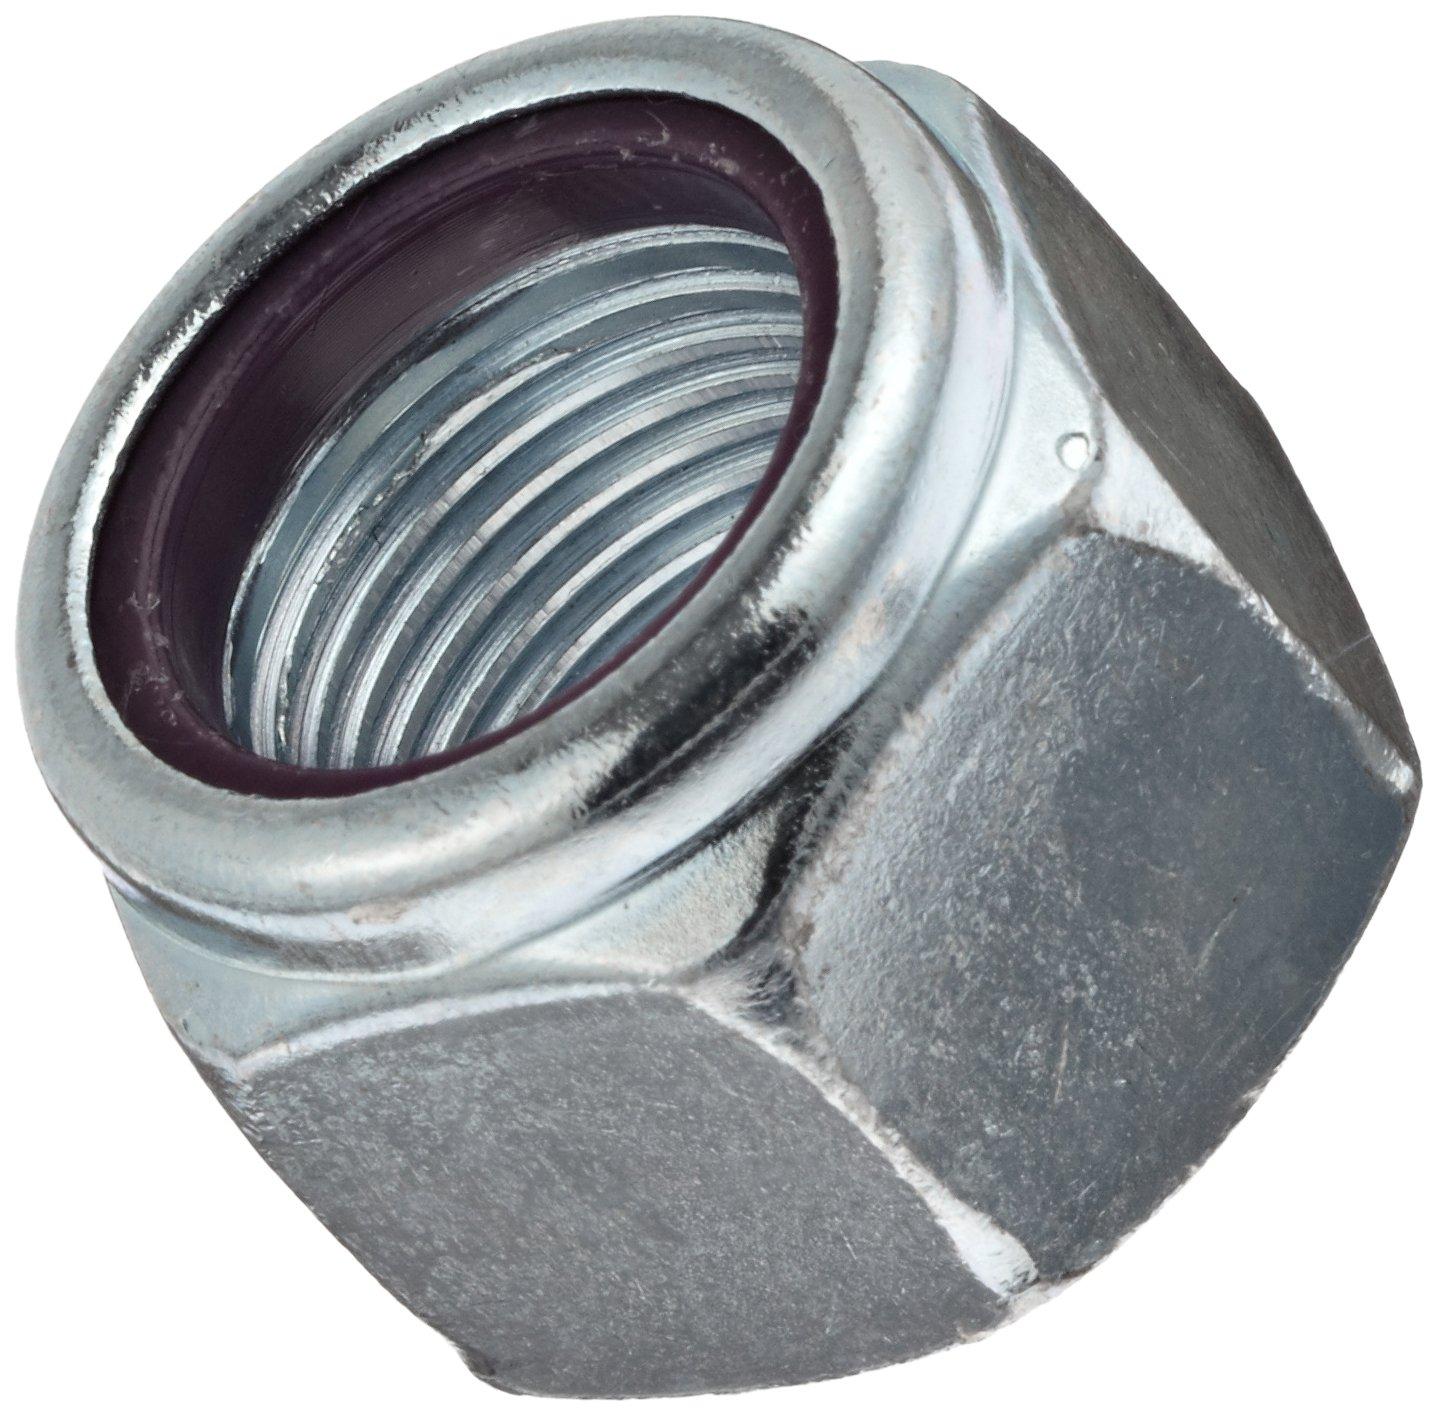 Steel Hex Nut Right Hand Threads Pack of 5 1.615 Width Across Flats Grade 5 Zinc Plated Finish Self-Locking Nylon Insert 1-14 Threads